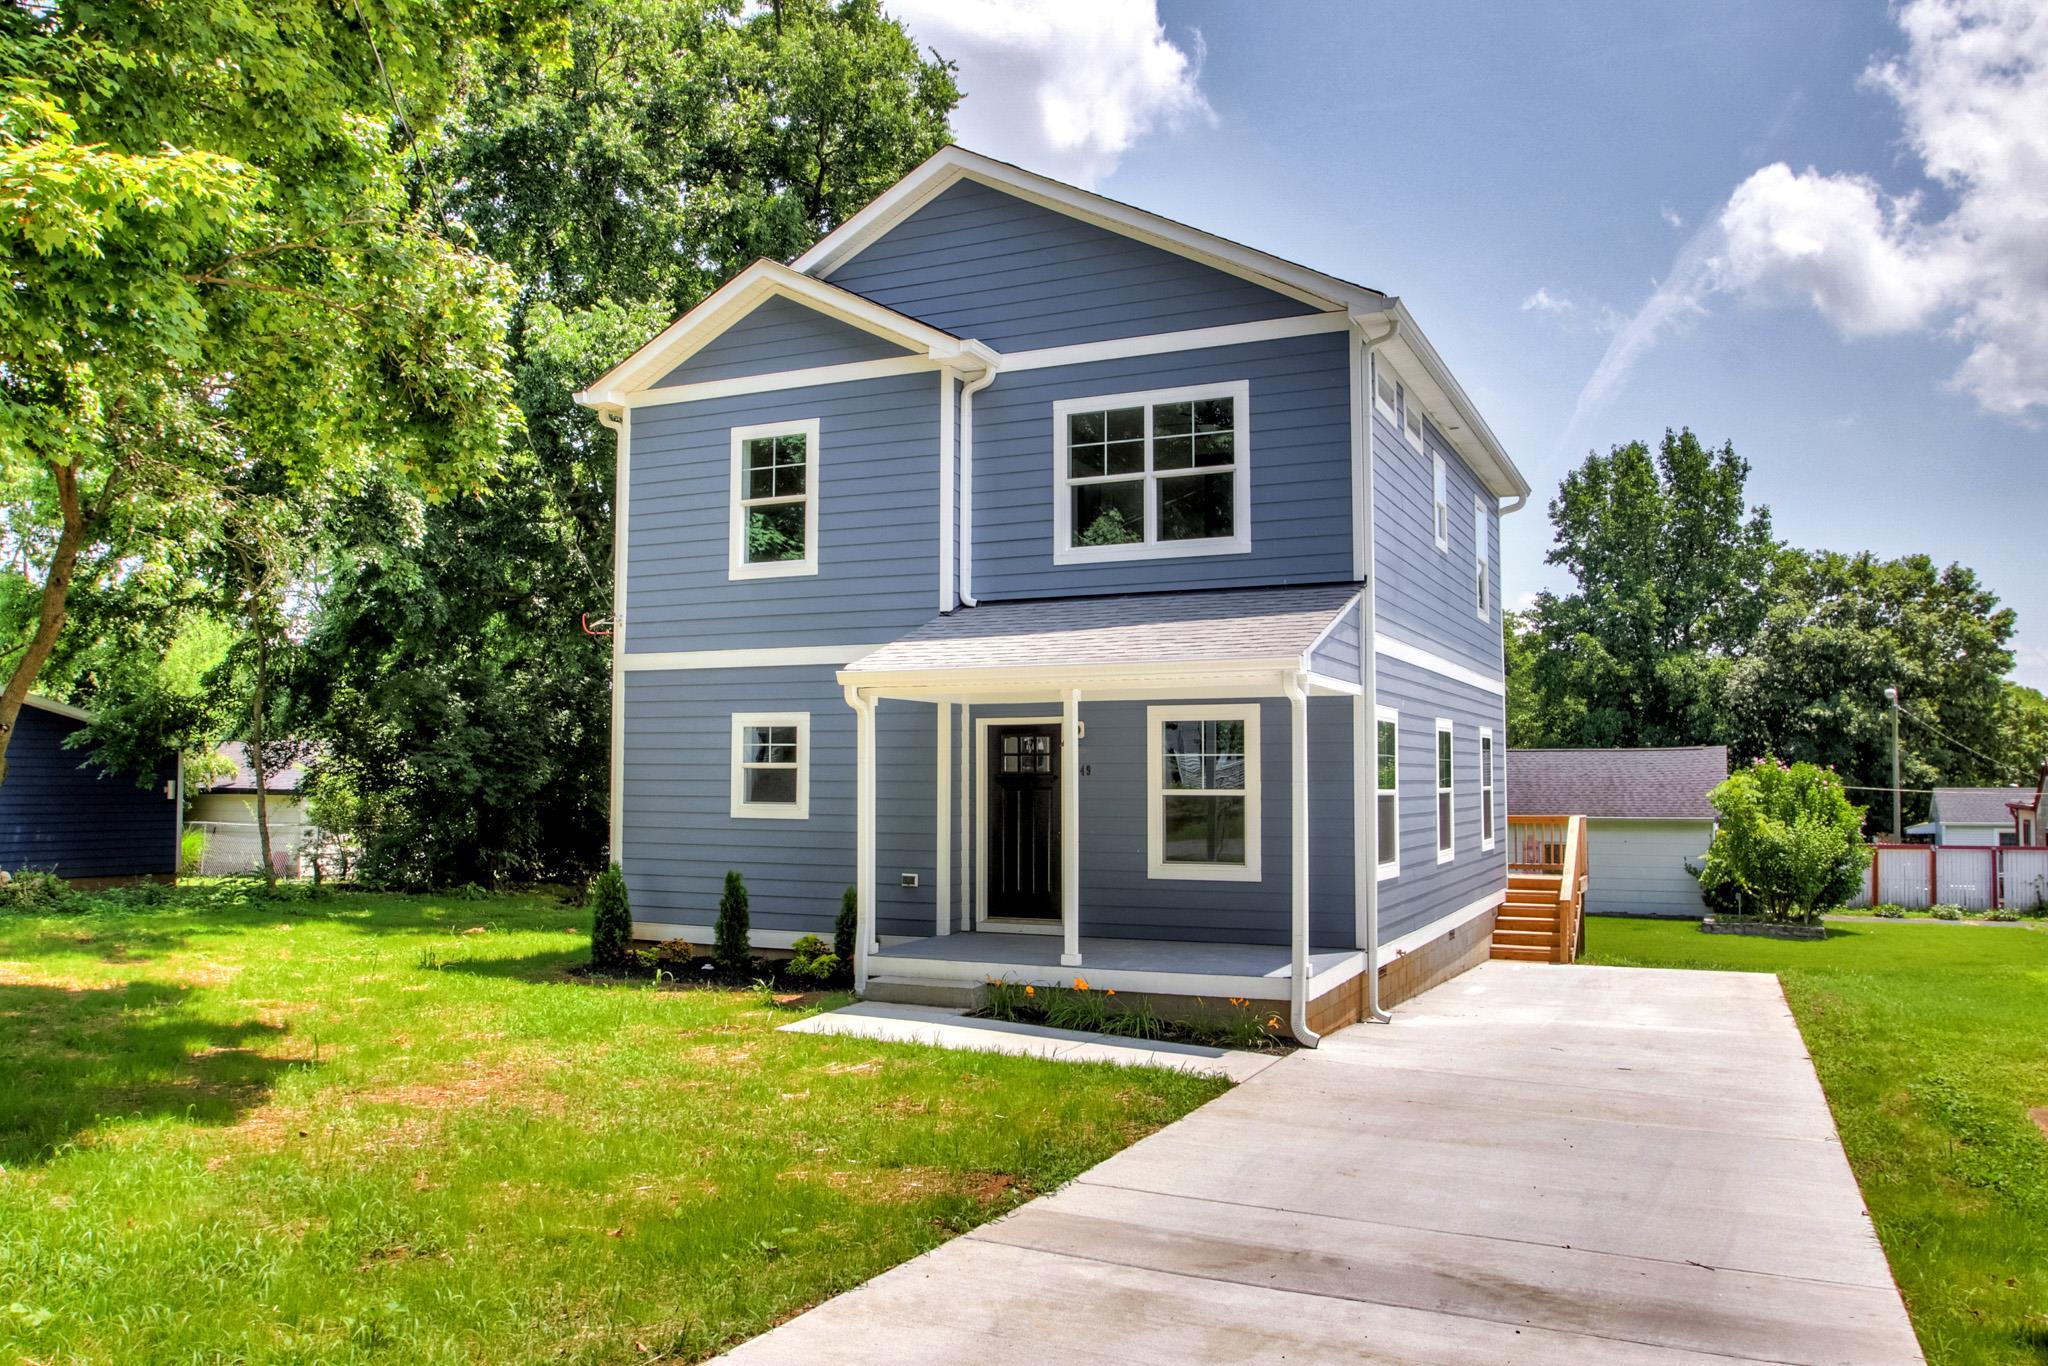 1049A Horseshoe Dr, Nashville, TN 37216 - Nashville, TN real estate listing